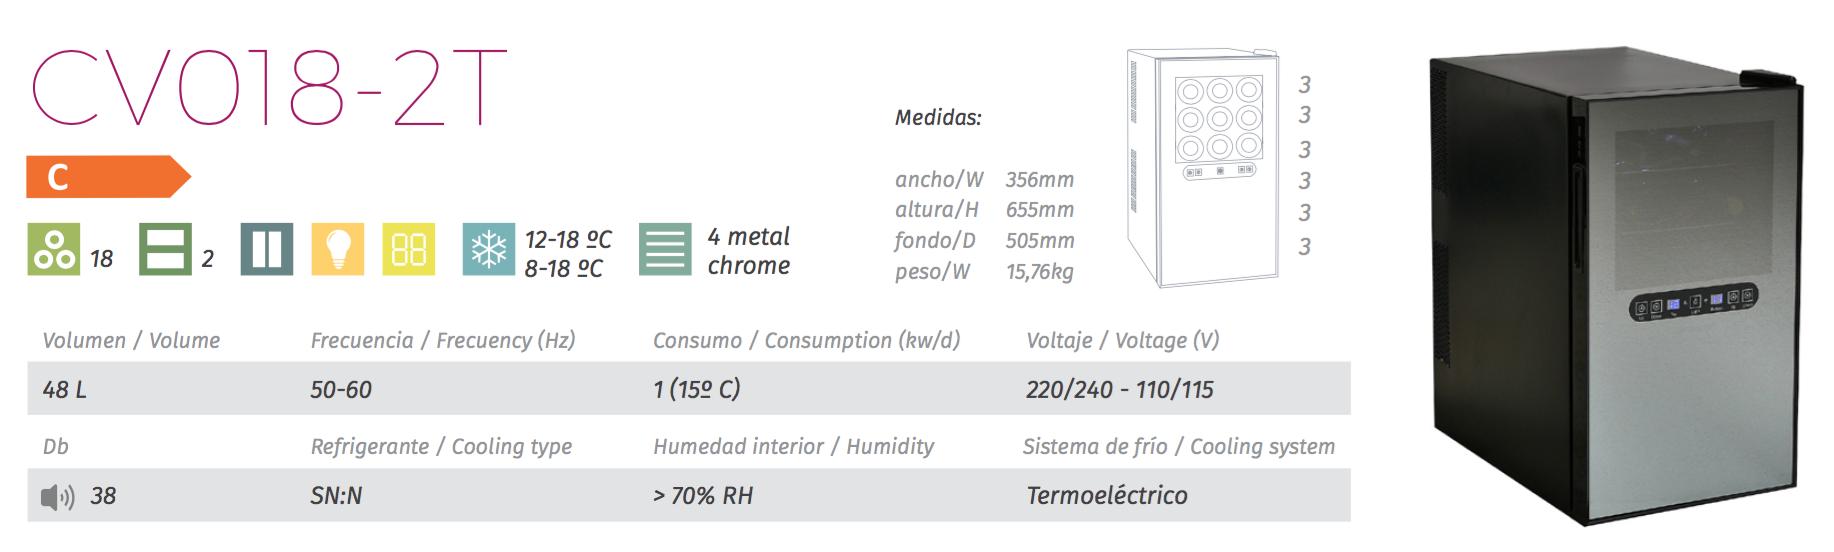 vinoteca cavanova CV018-2T tabla caracteristicas